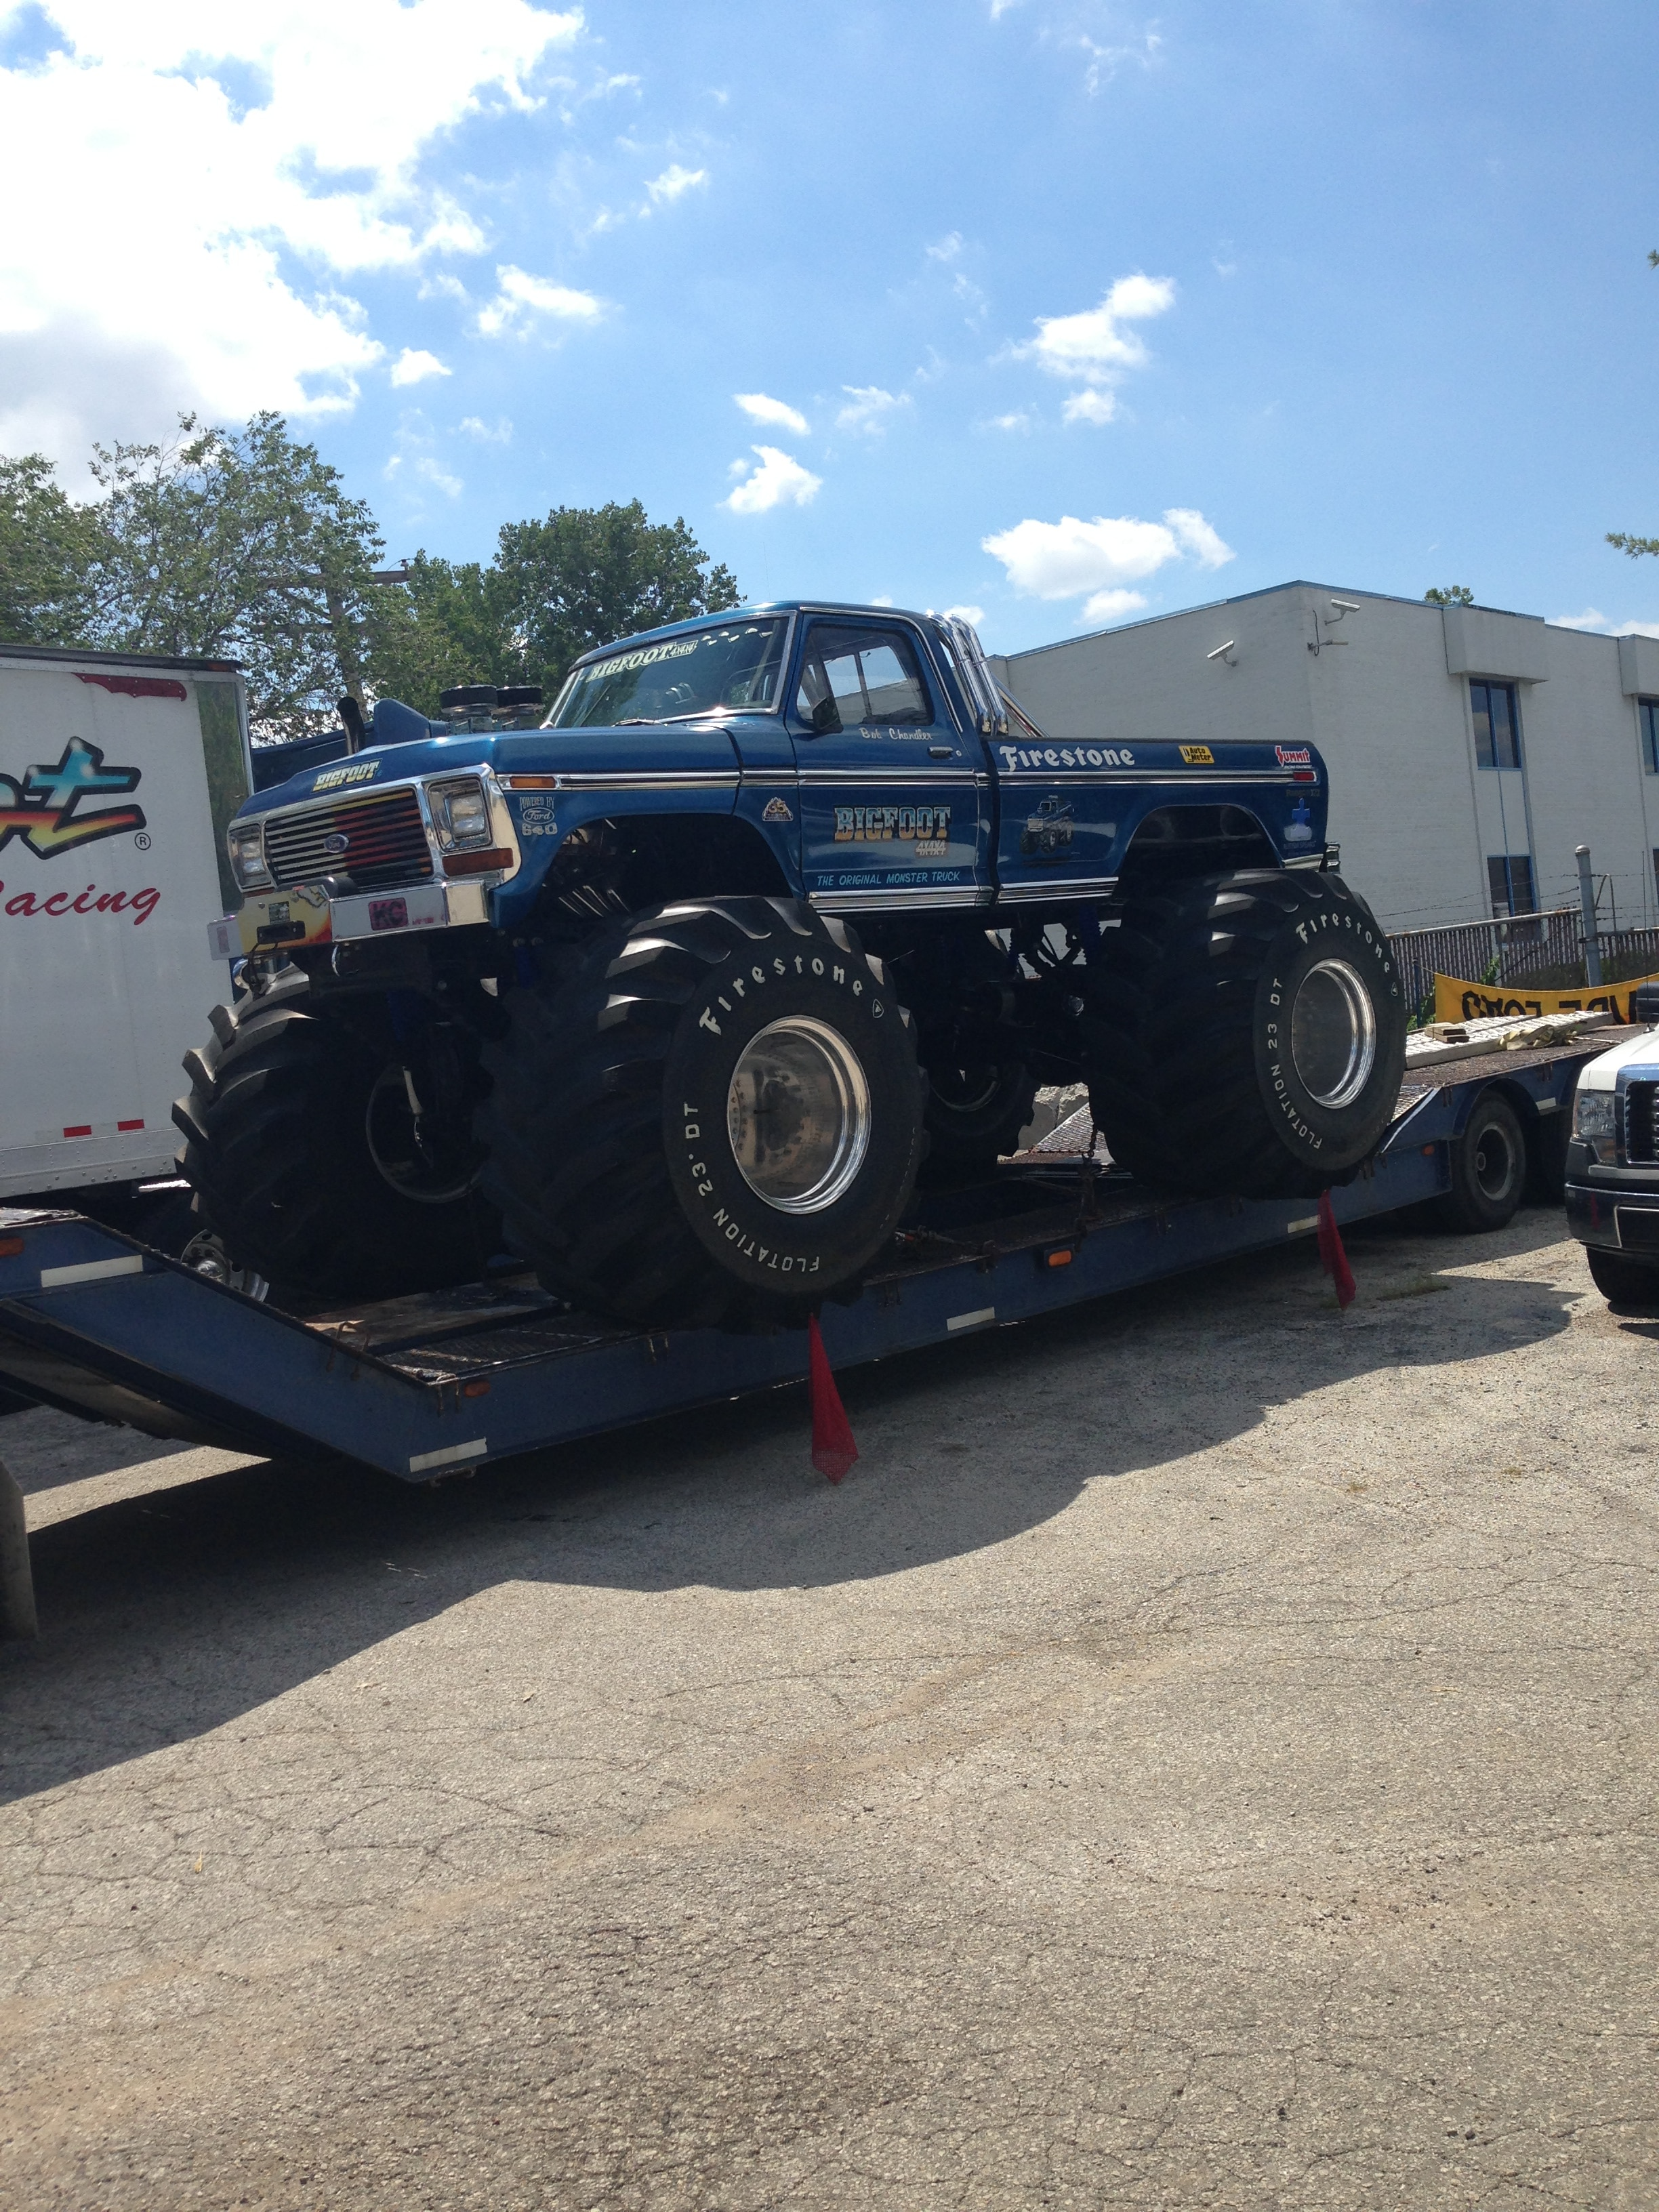 Ultimate Adventure 2014 Day 7 Road Day  41   Bigfoot Monster Truck on trailer.JPG